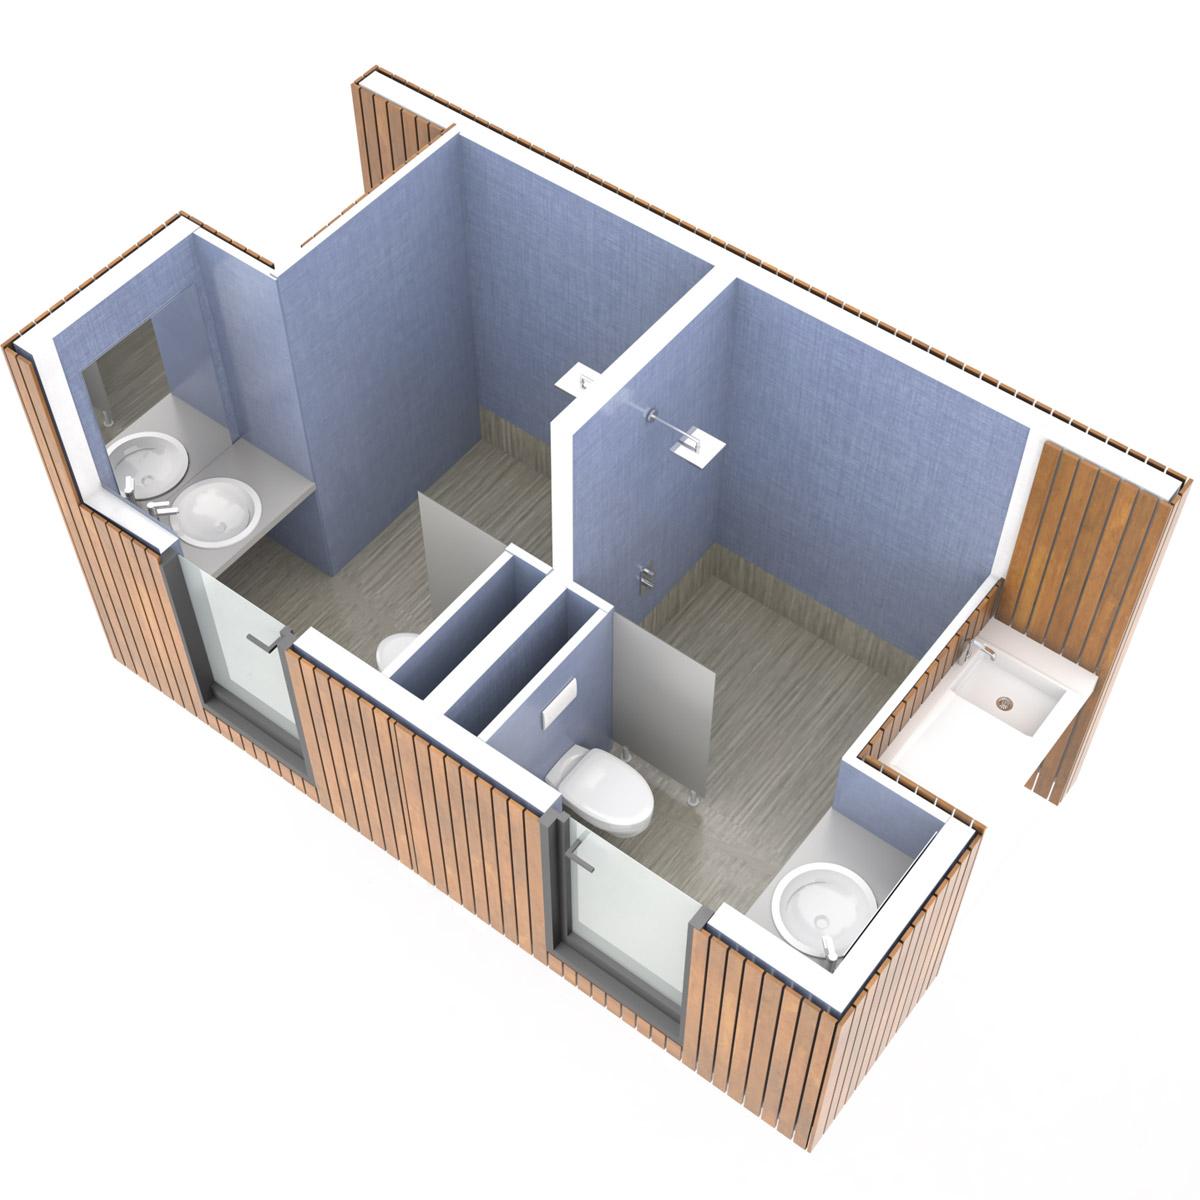 SANIBIO® INDIVIDUEL X1 bloc sanitaire, sanitaire modulaire